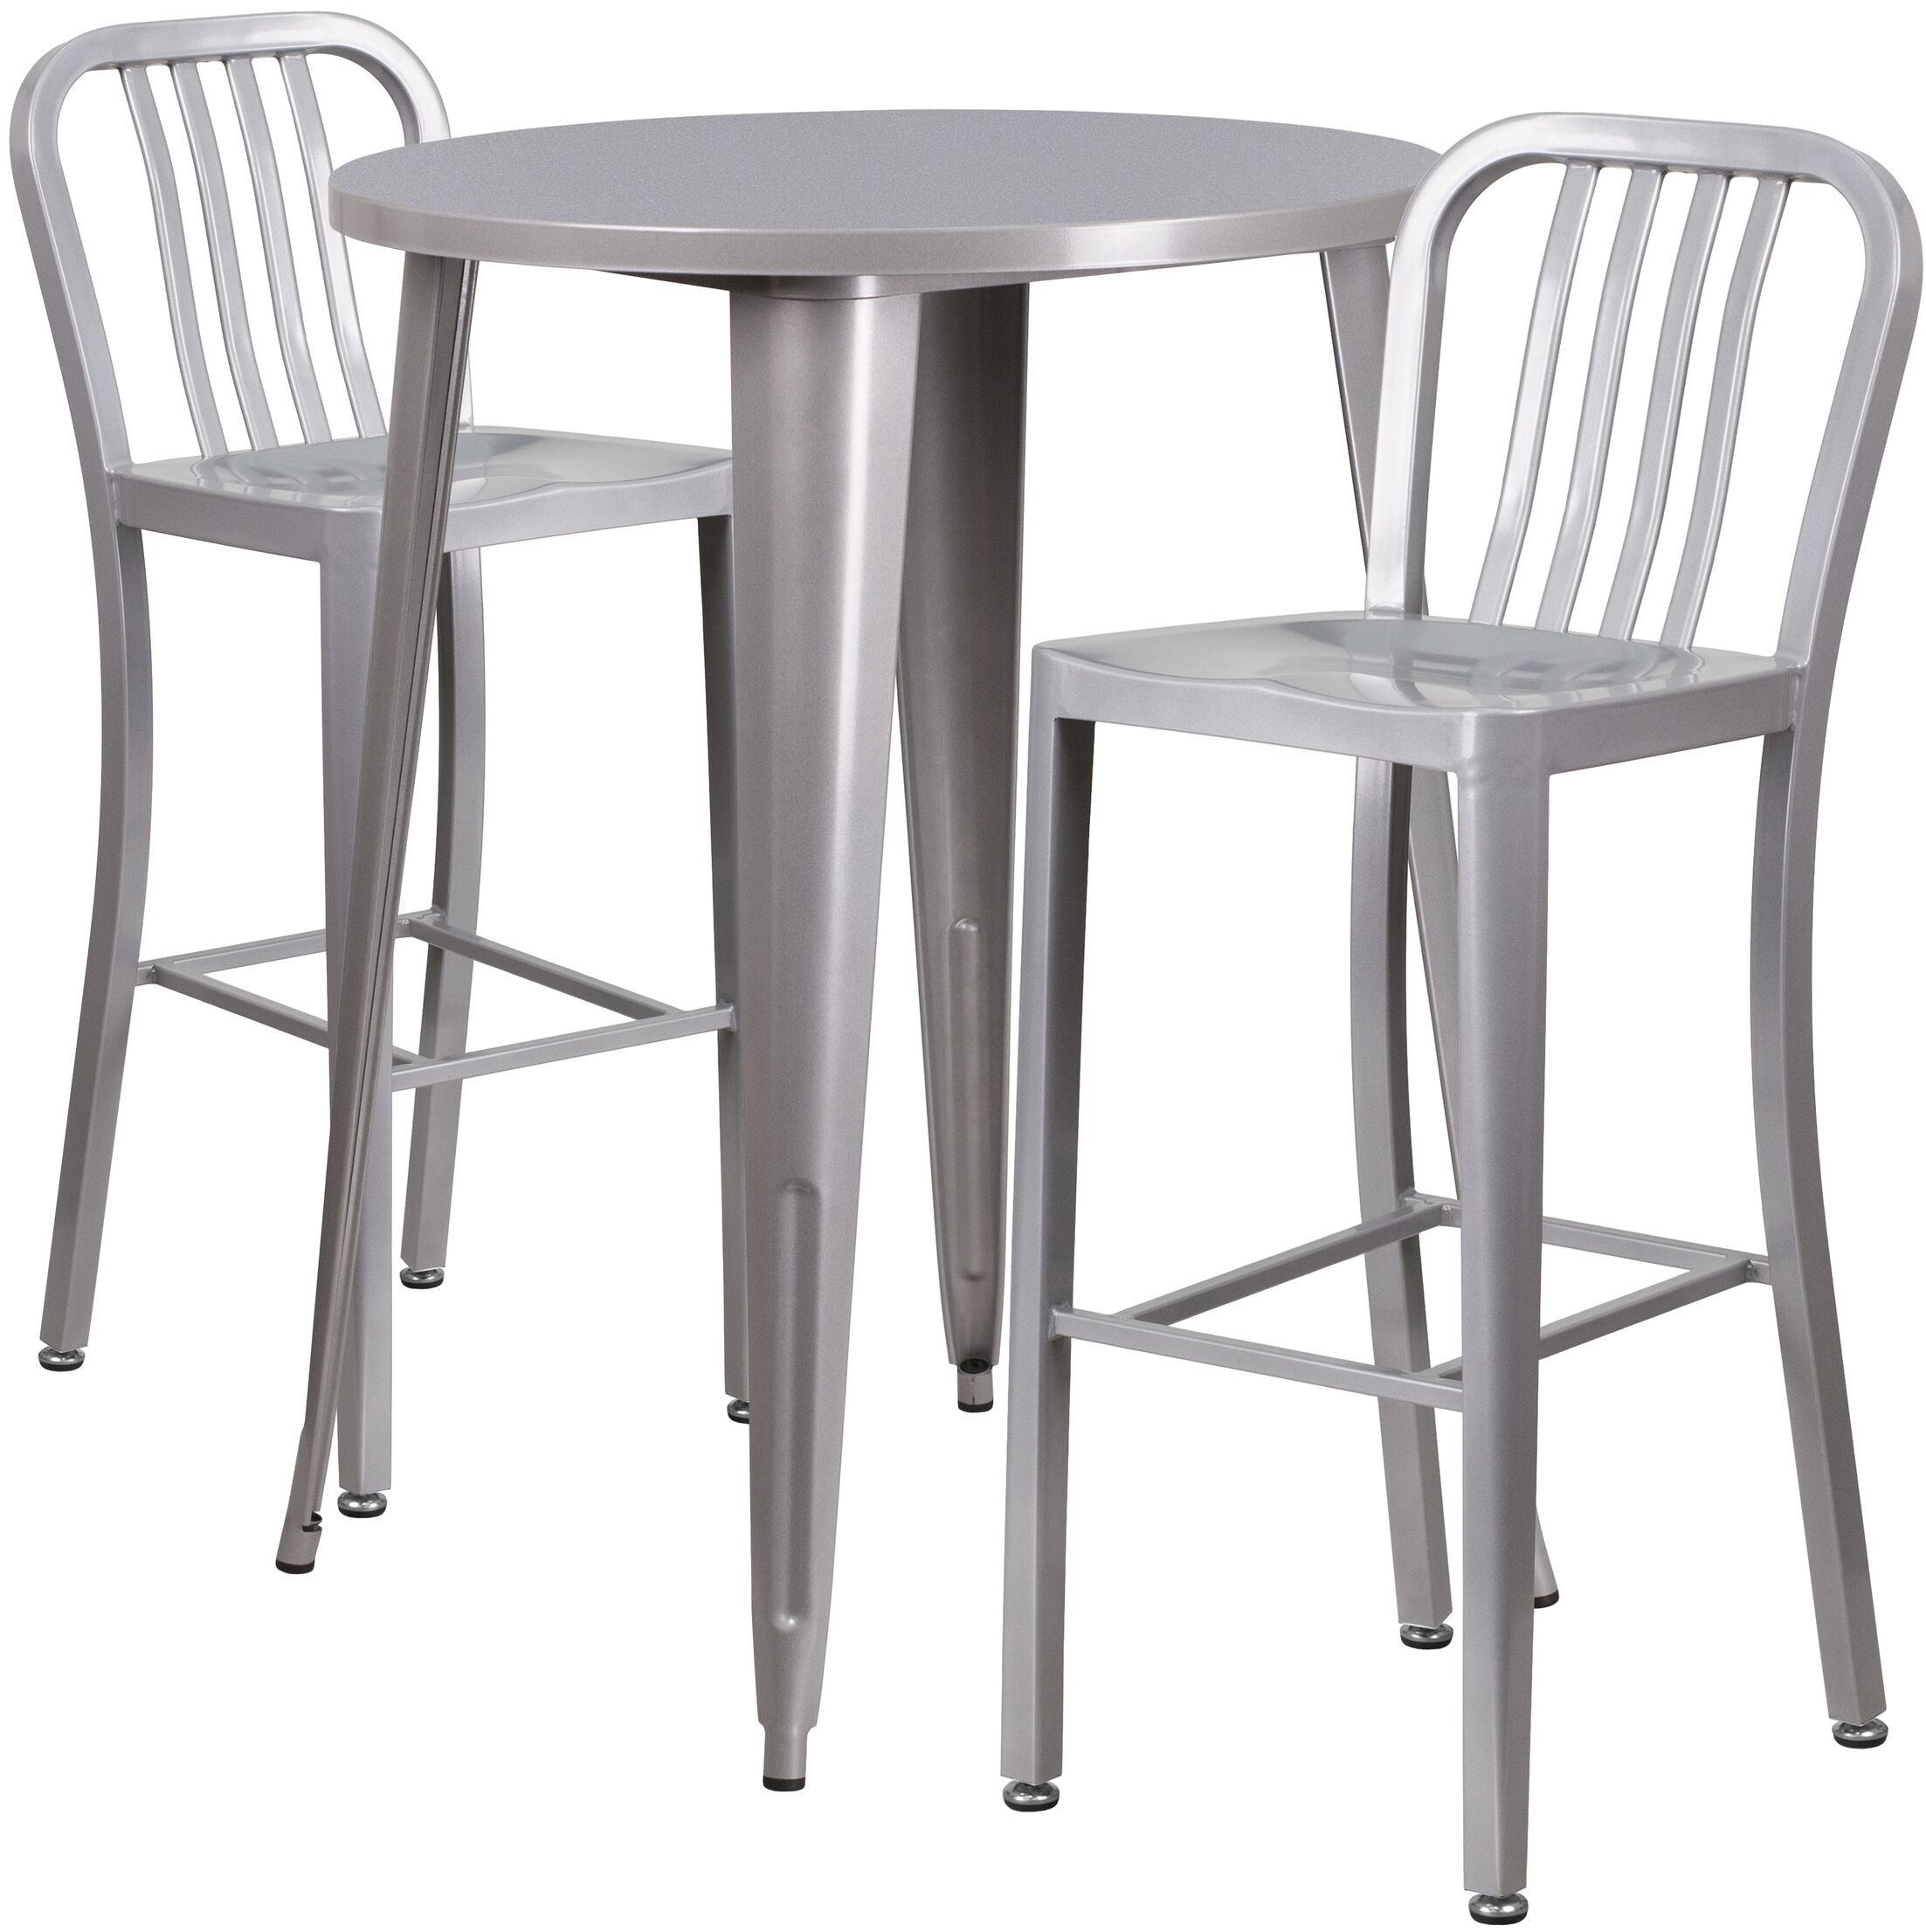 Avera 3 Piece Bar Height Dining Set Finish: Silver